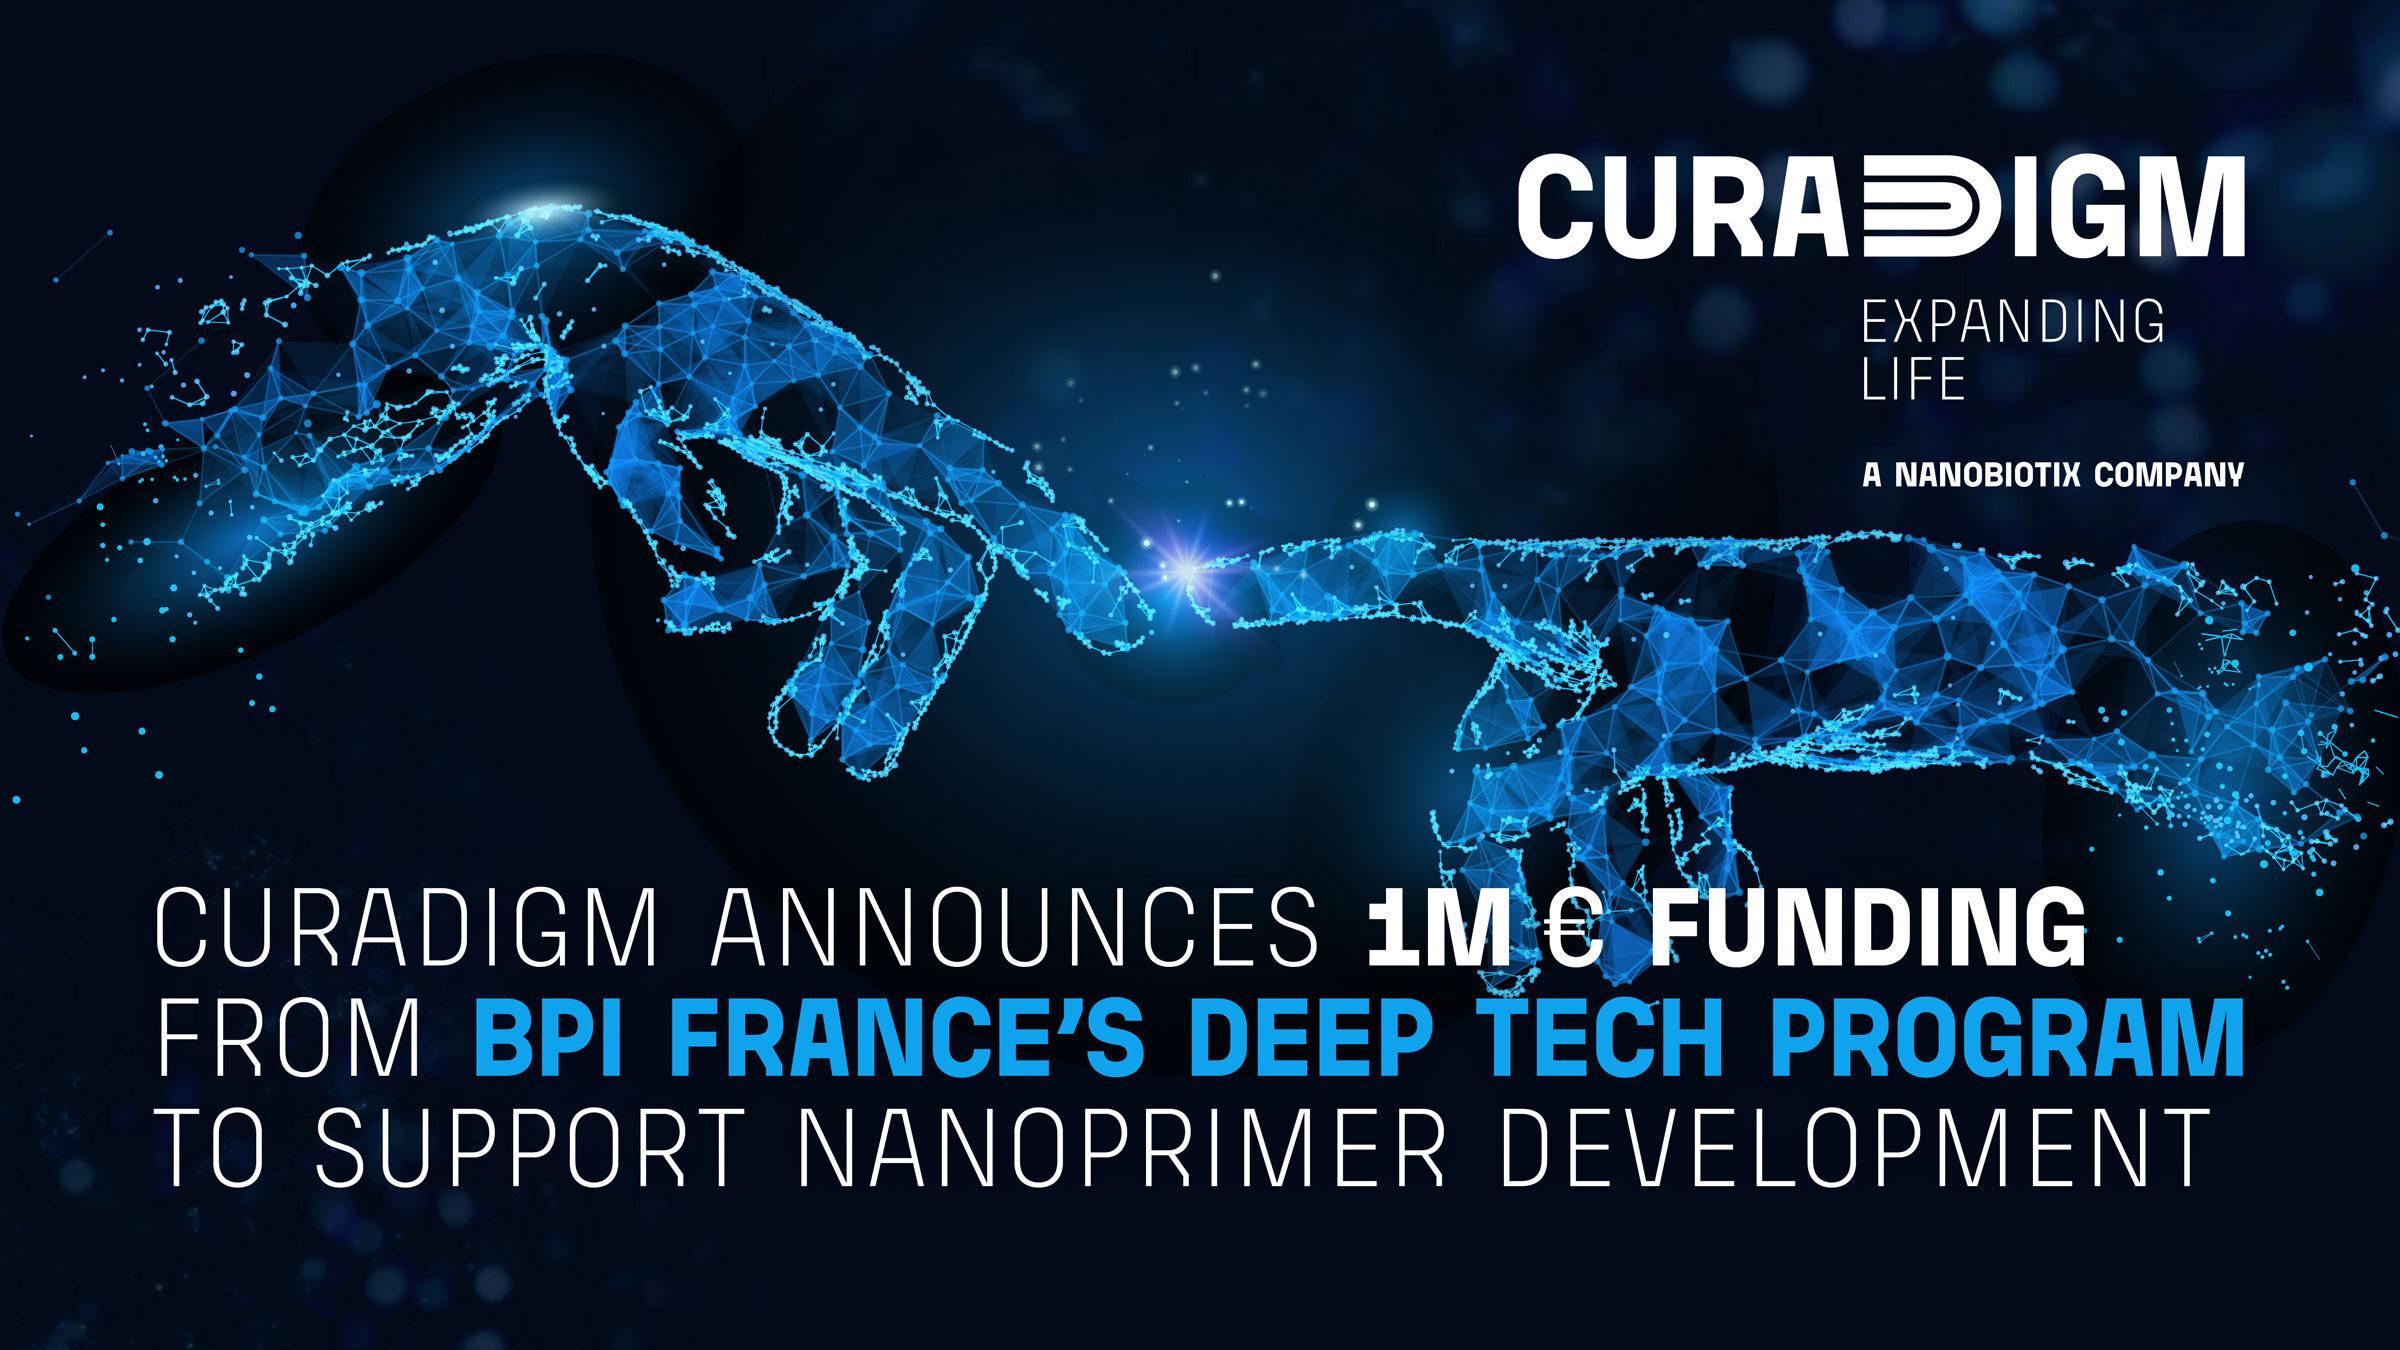 CURADIGM ANNOUNCES 1 MILLION € FUNDING FROM BPI FRANCE'S DEEP TECH PROGRAM TO SUPPORT DEVELOPMENT OF THE NANOPRIMER PLATFORM